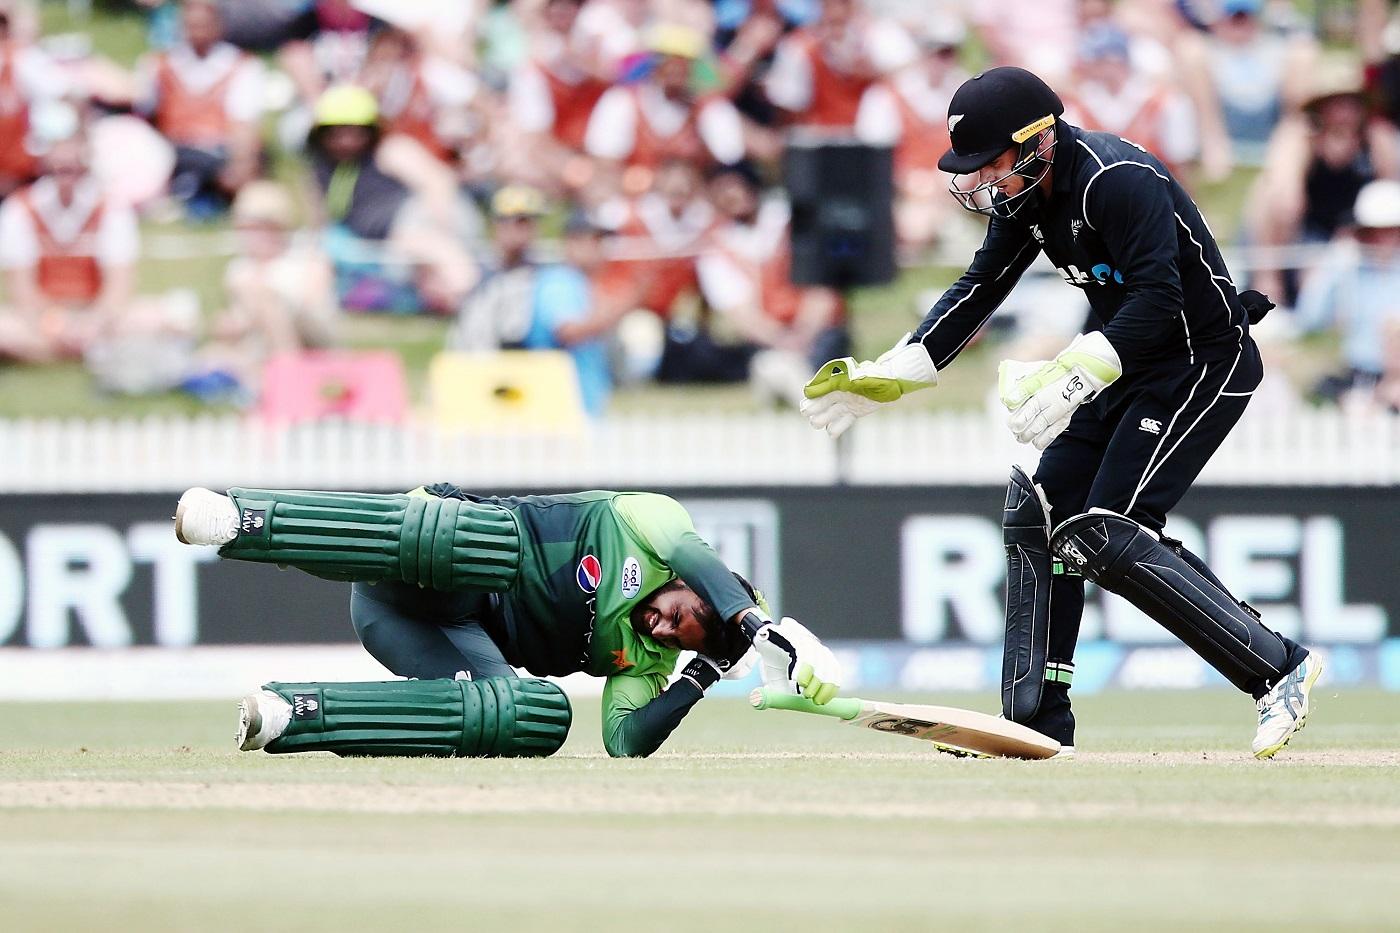 Pakistan vs New Zealand 4th ODI Highlights